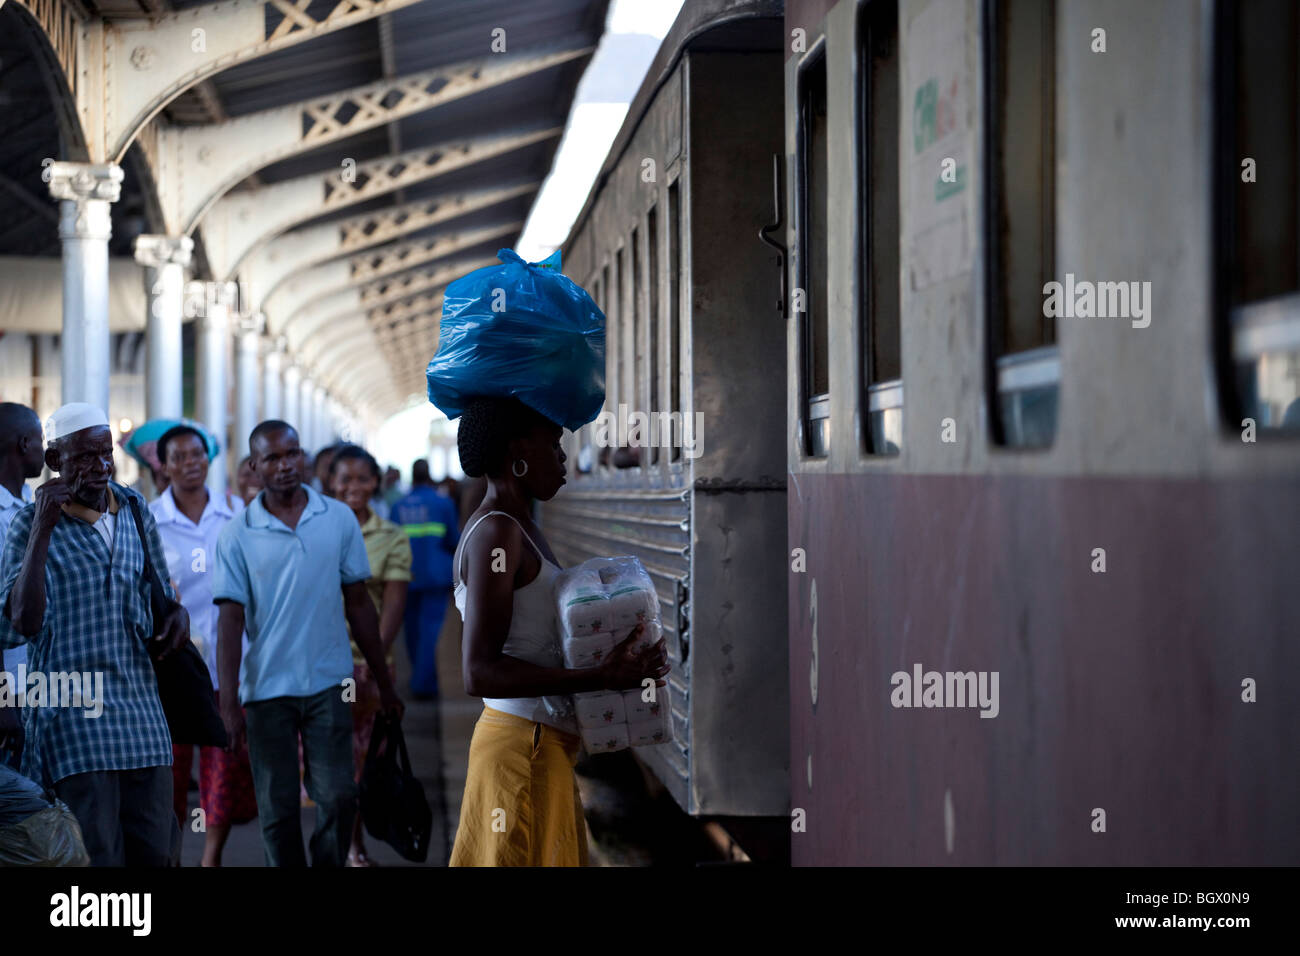 inside the Maputo train station, Mozambique - Stock Image